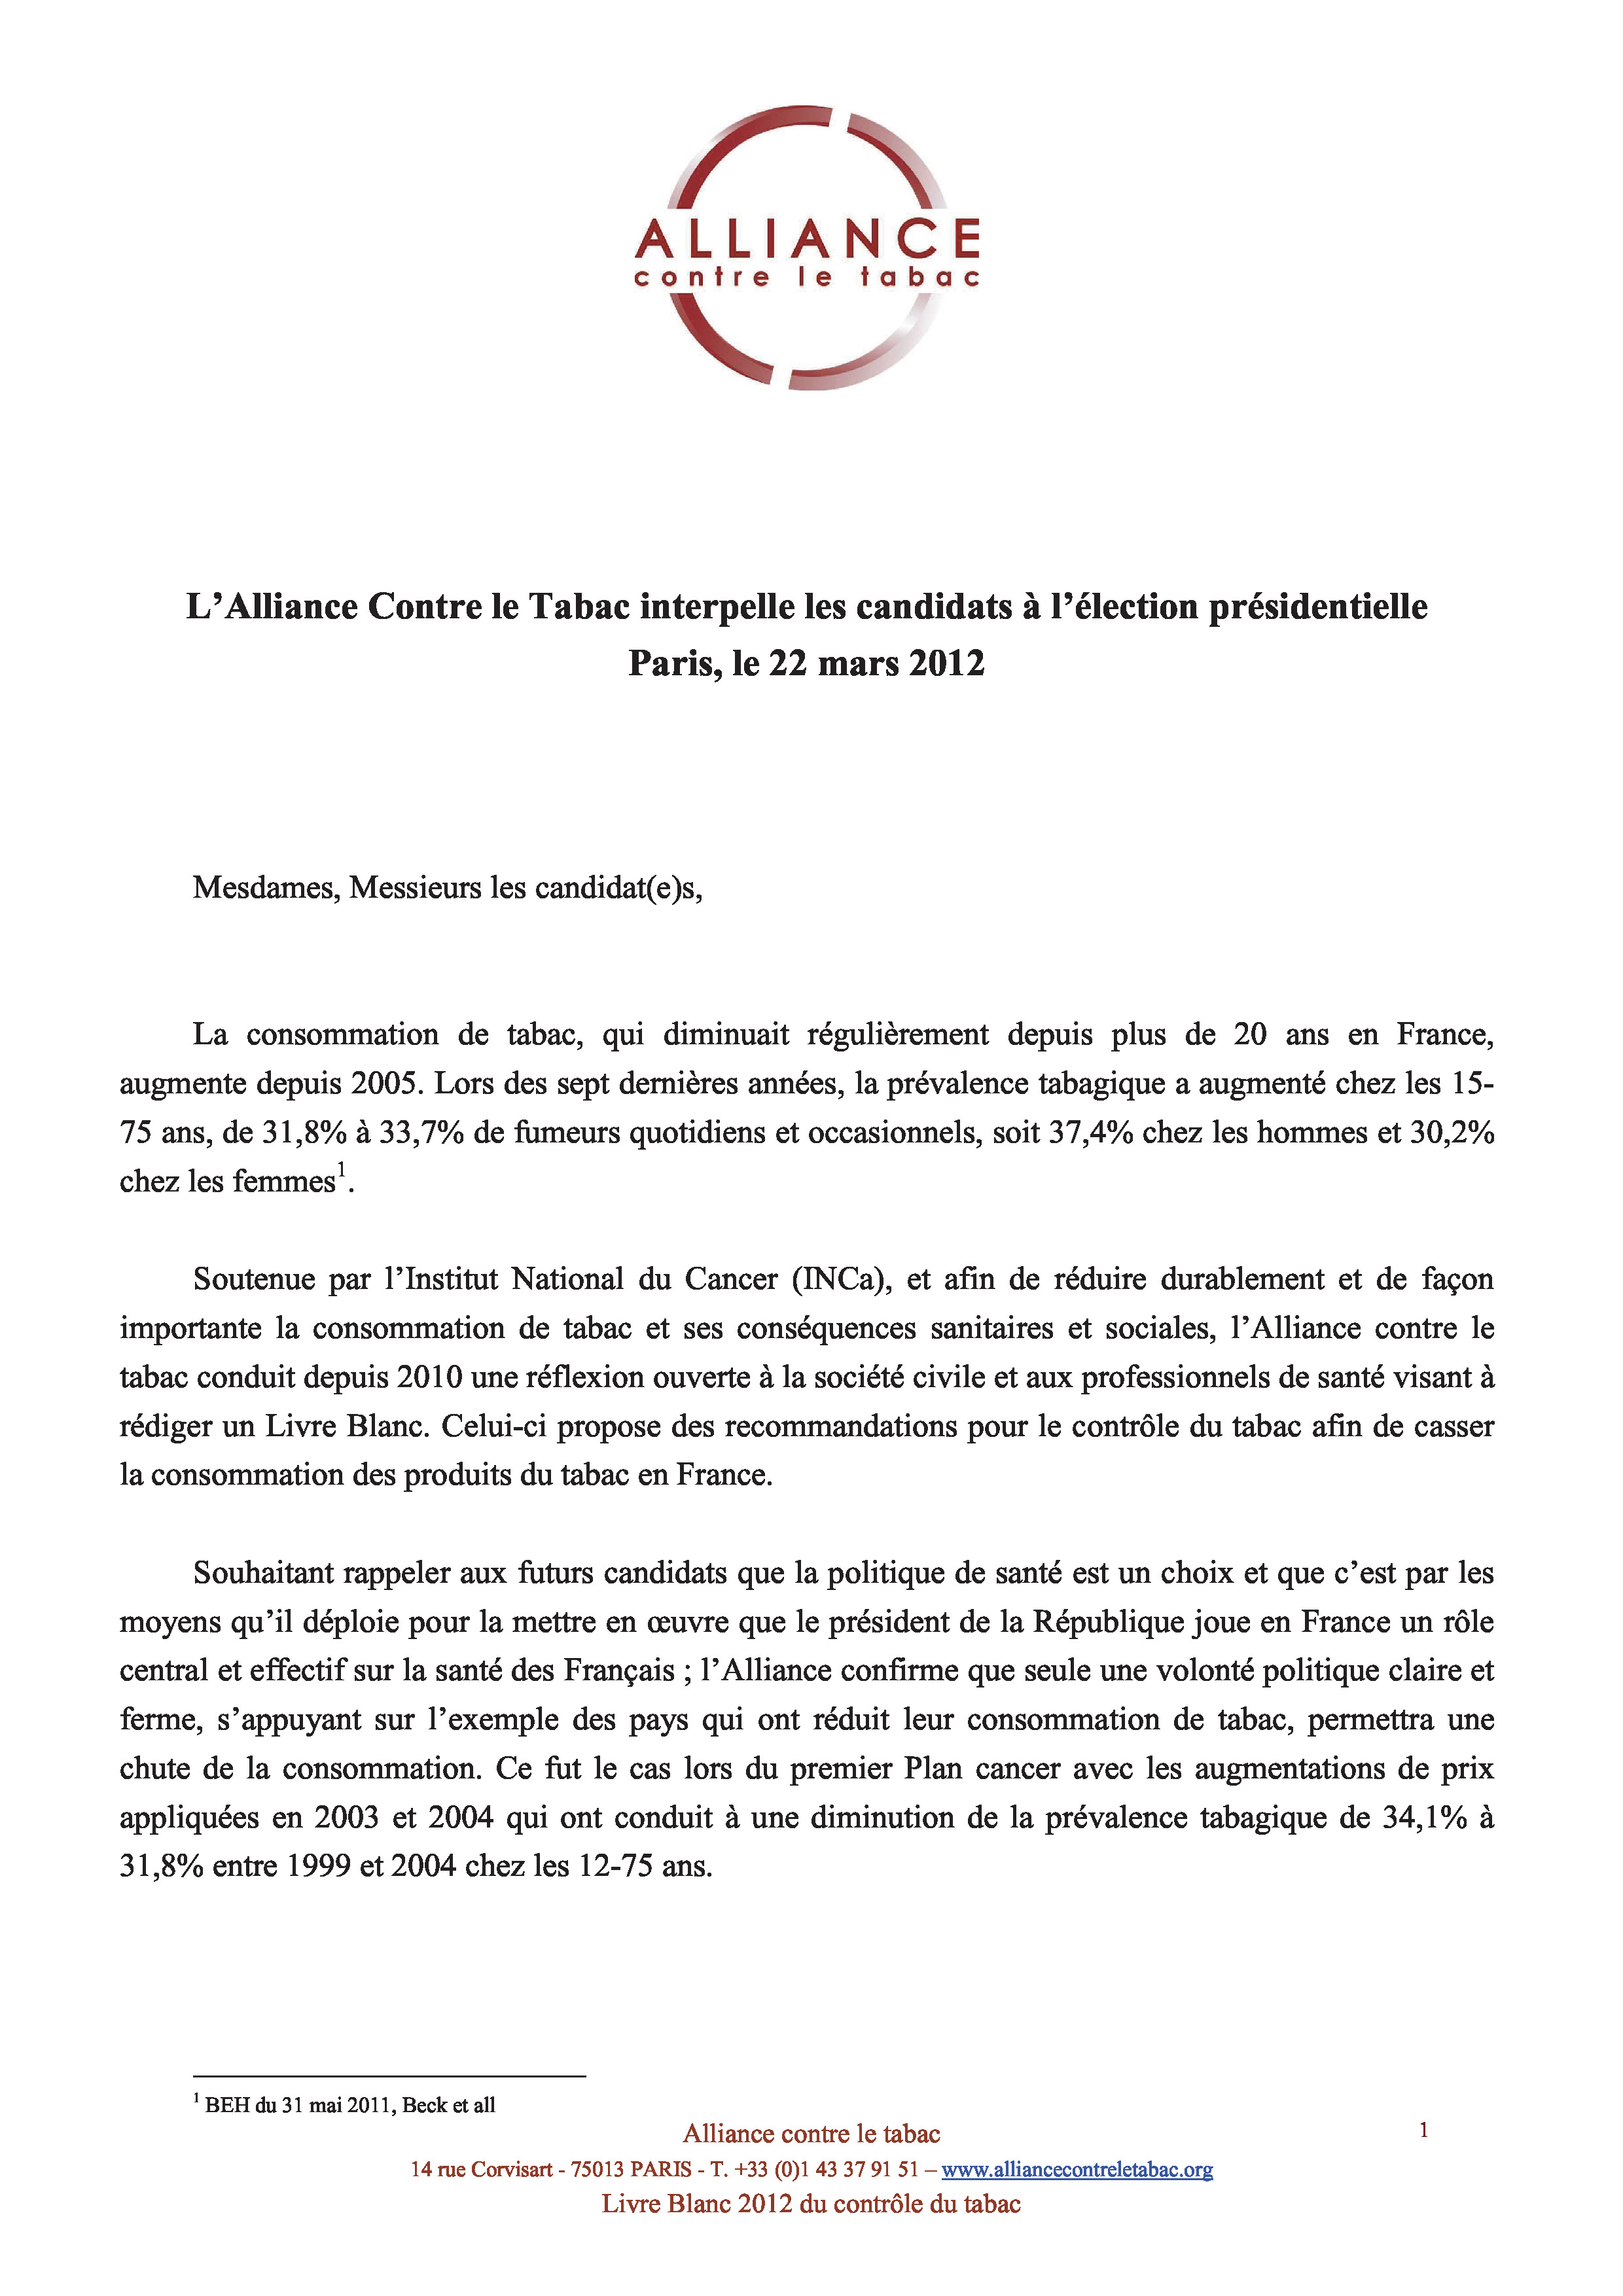 Alliance-dossier-presse-livre-blanc-11avr2012_Page_02.jpg